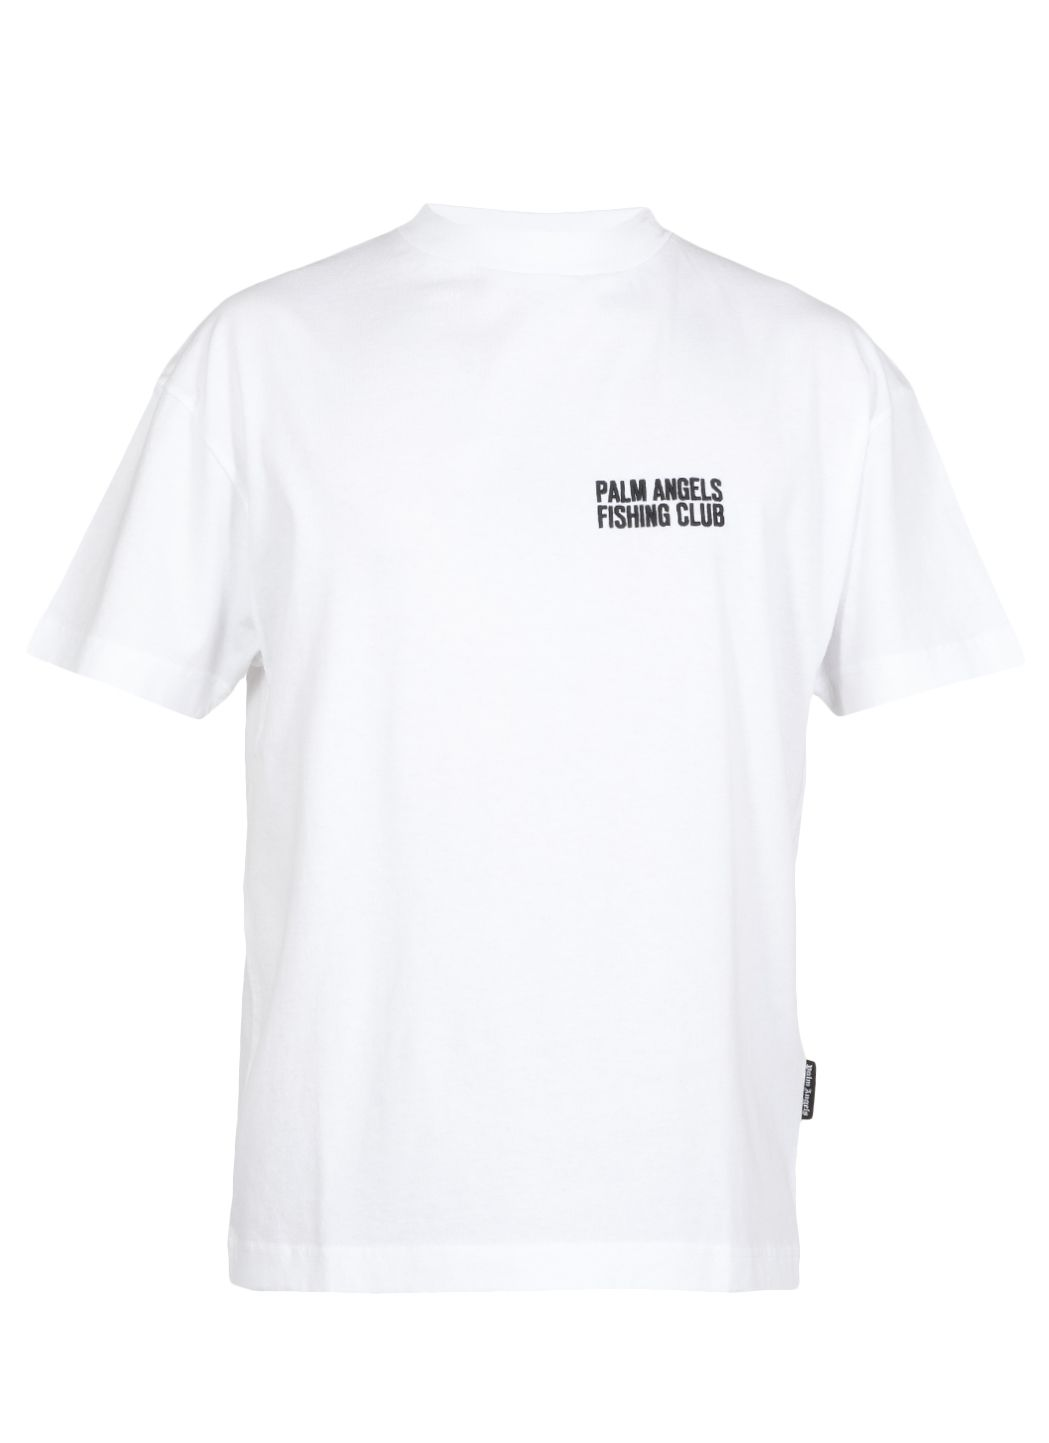 T-shirt in cotone Fishing club